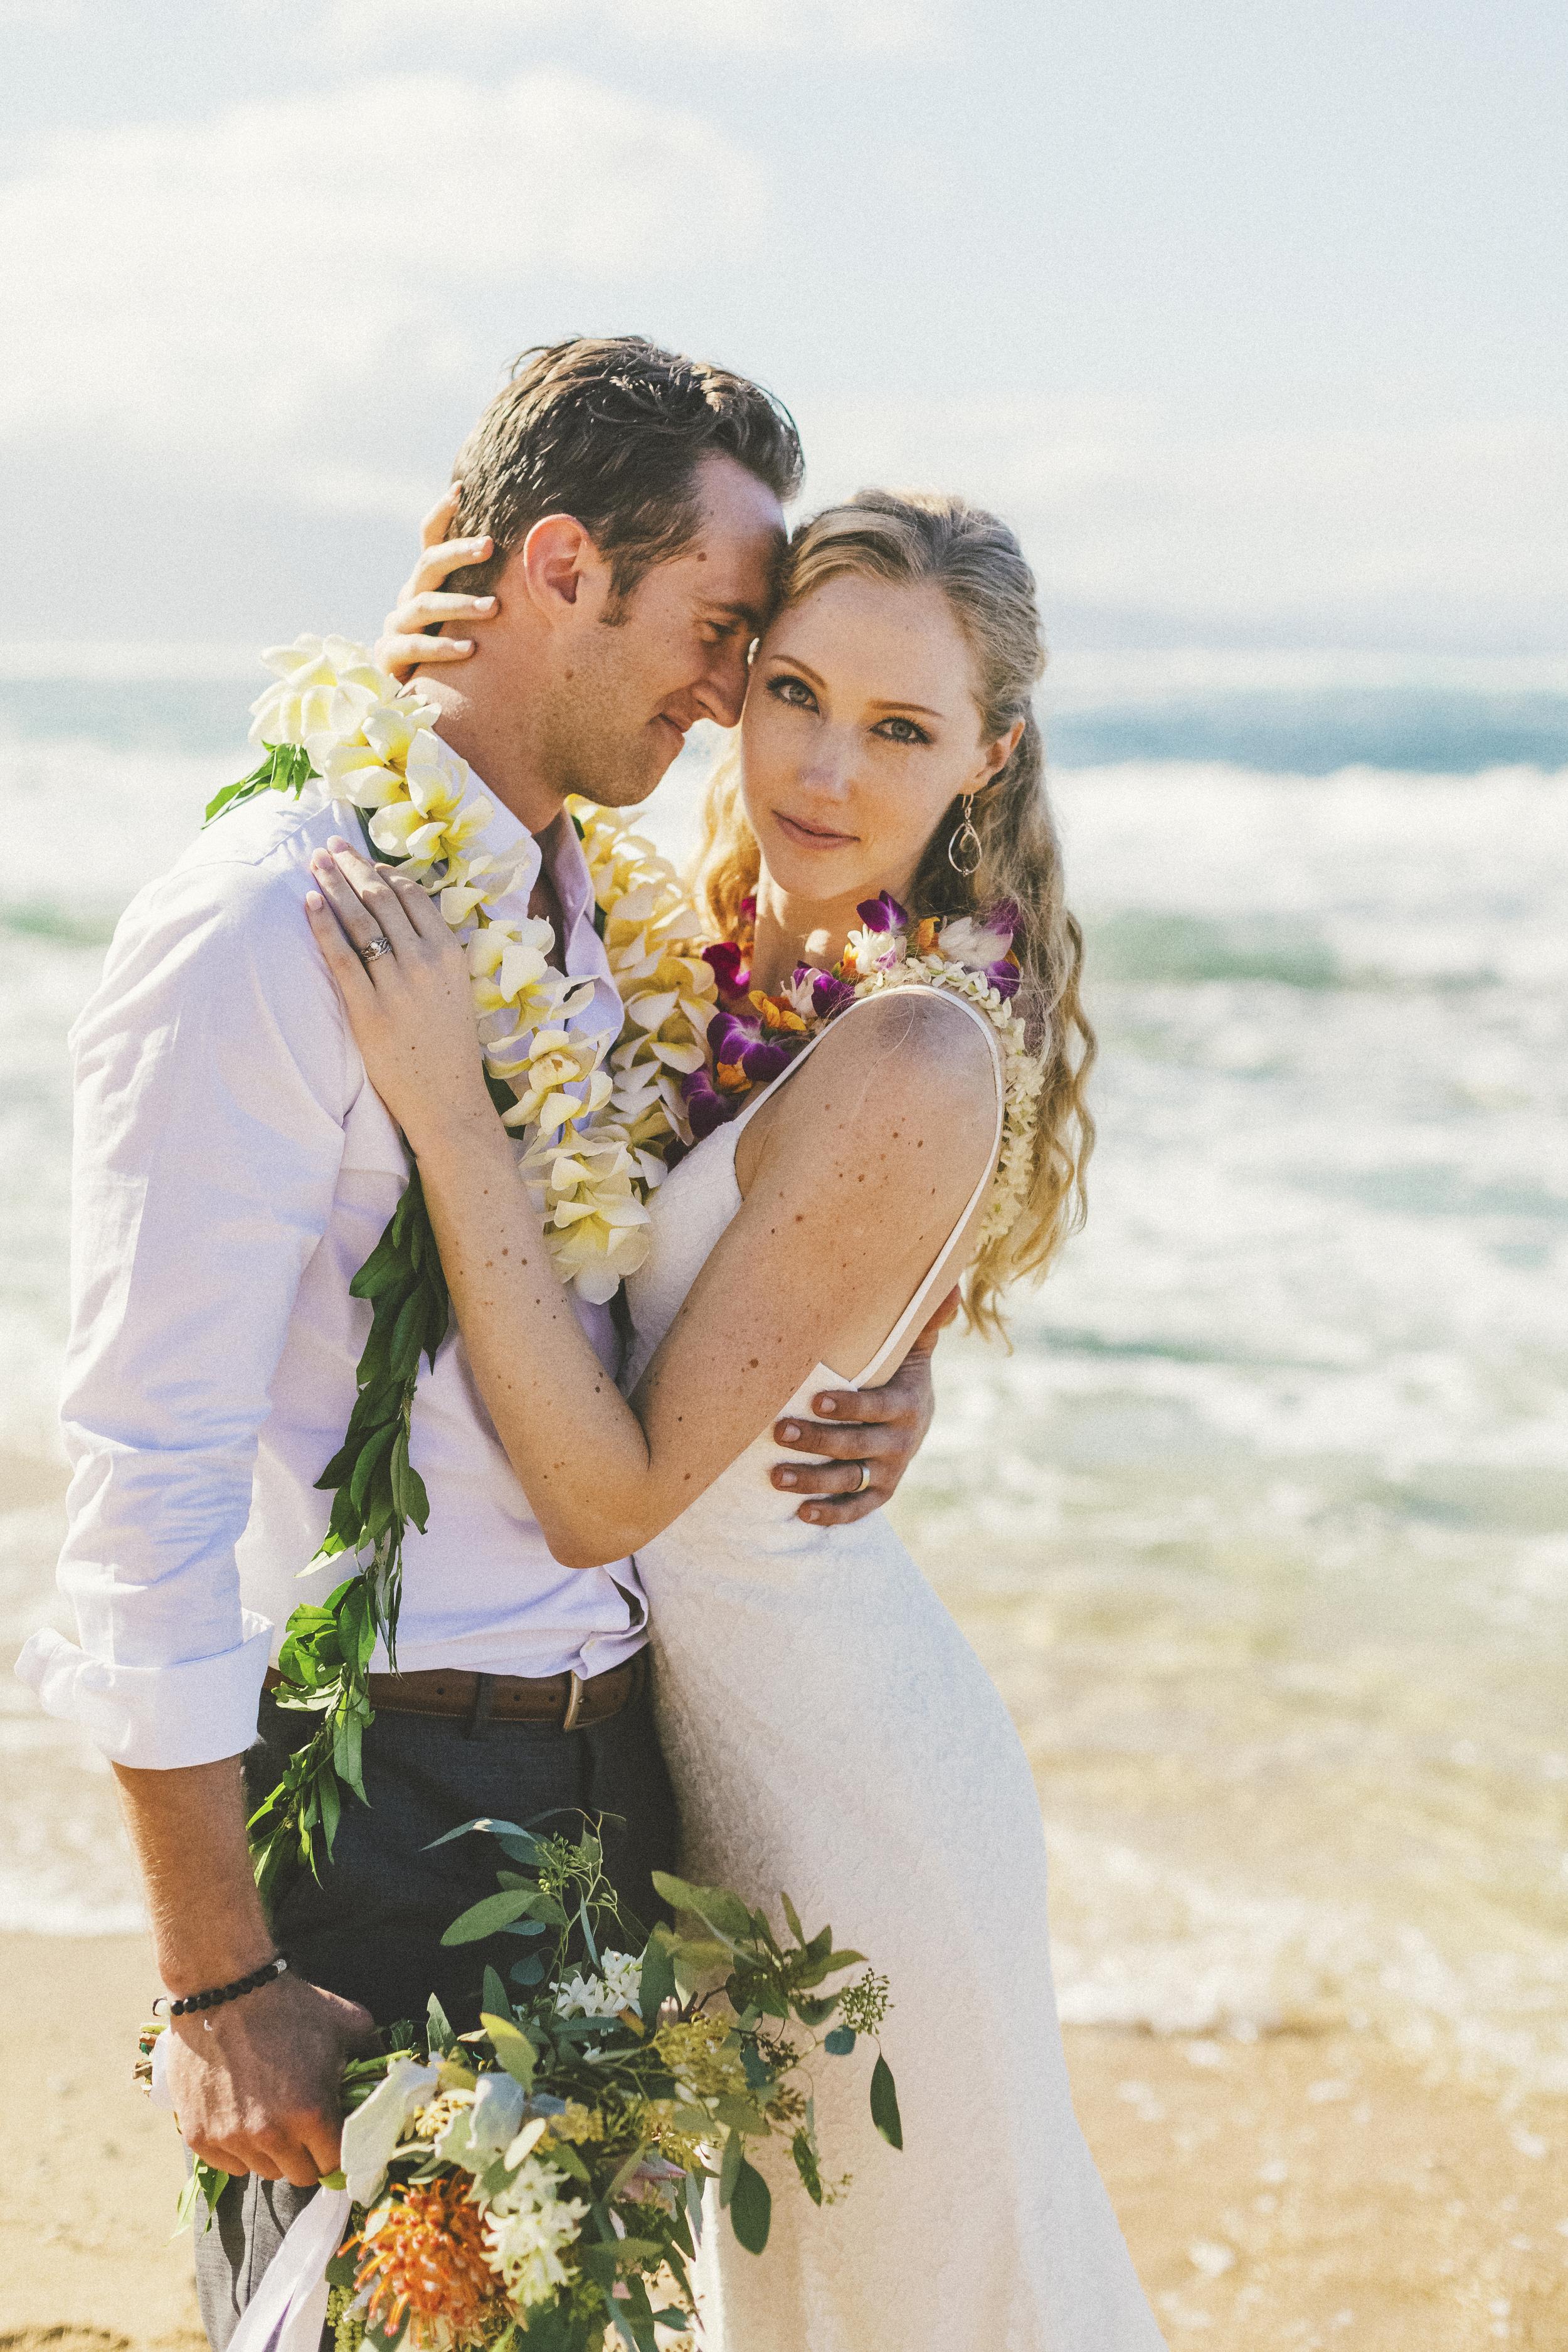 angie-diaz-photography-maui-wedding-73.jpg